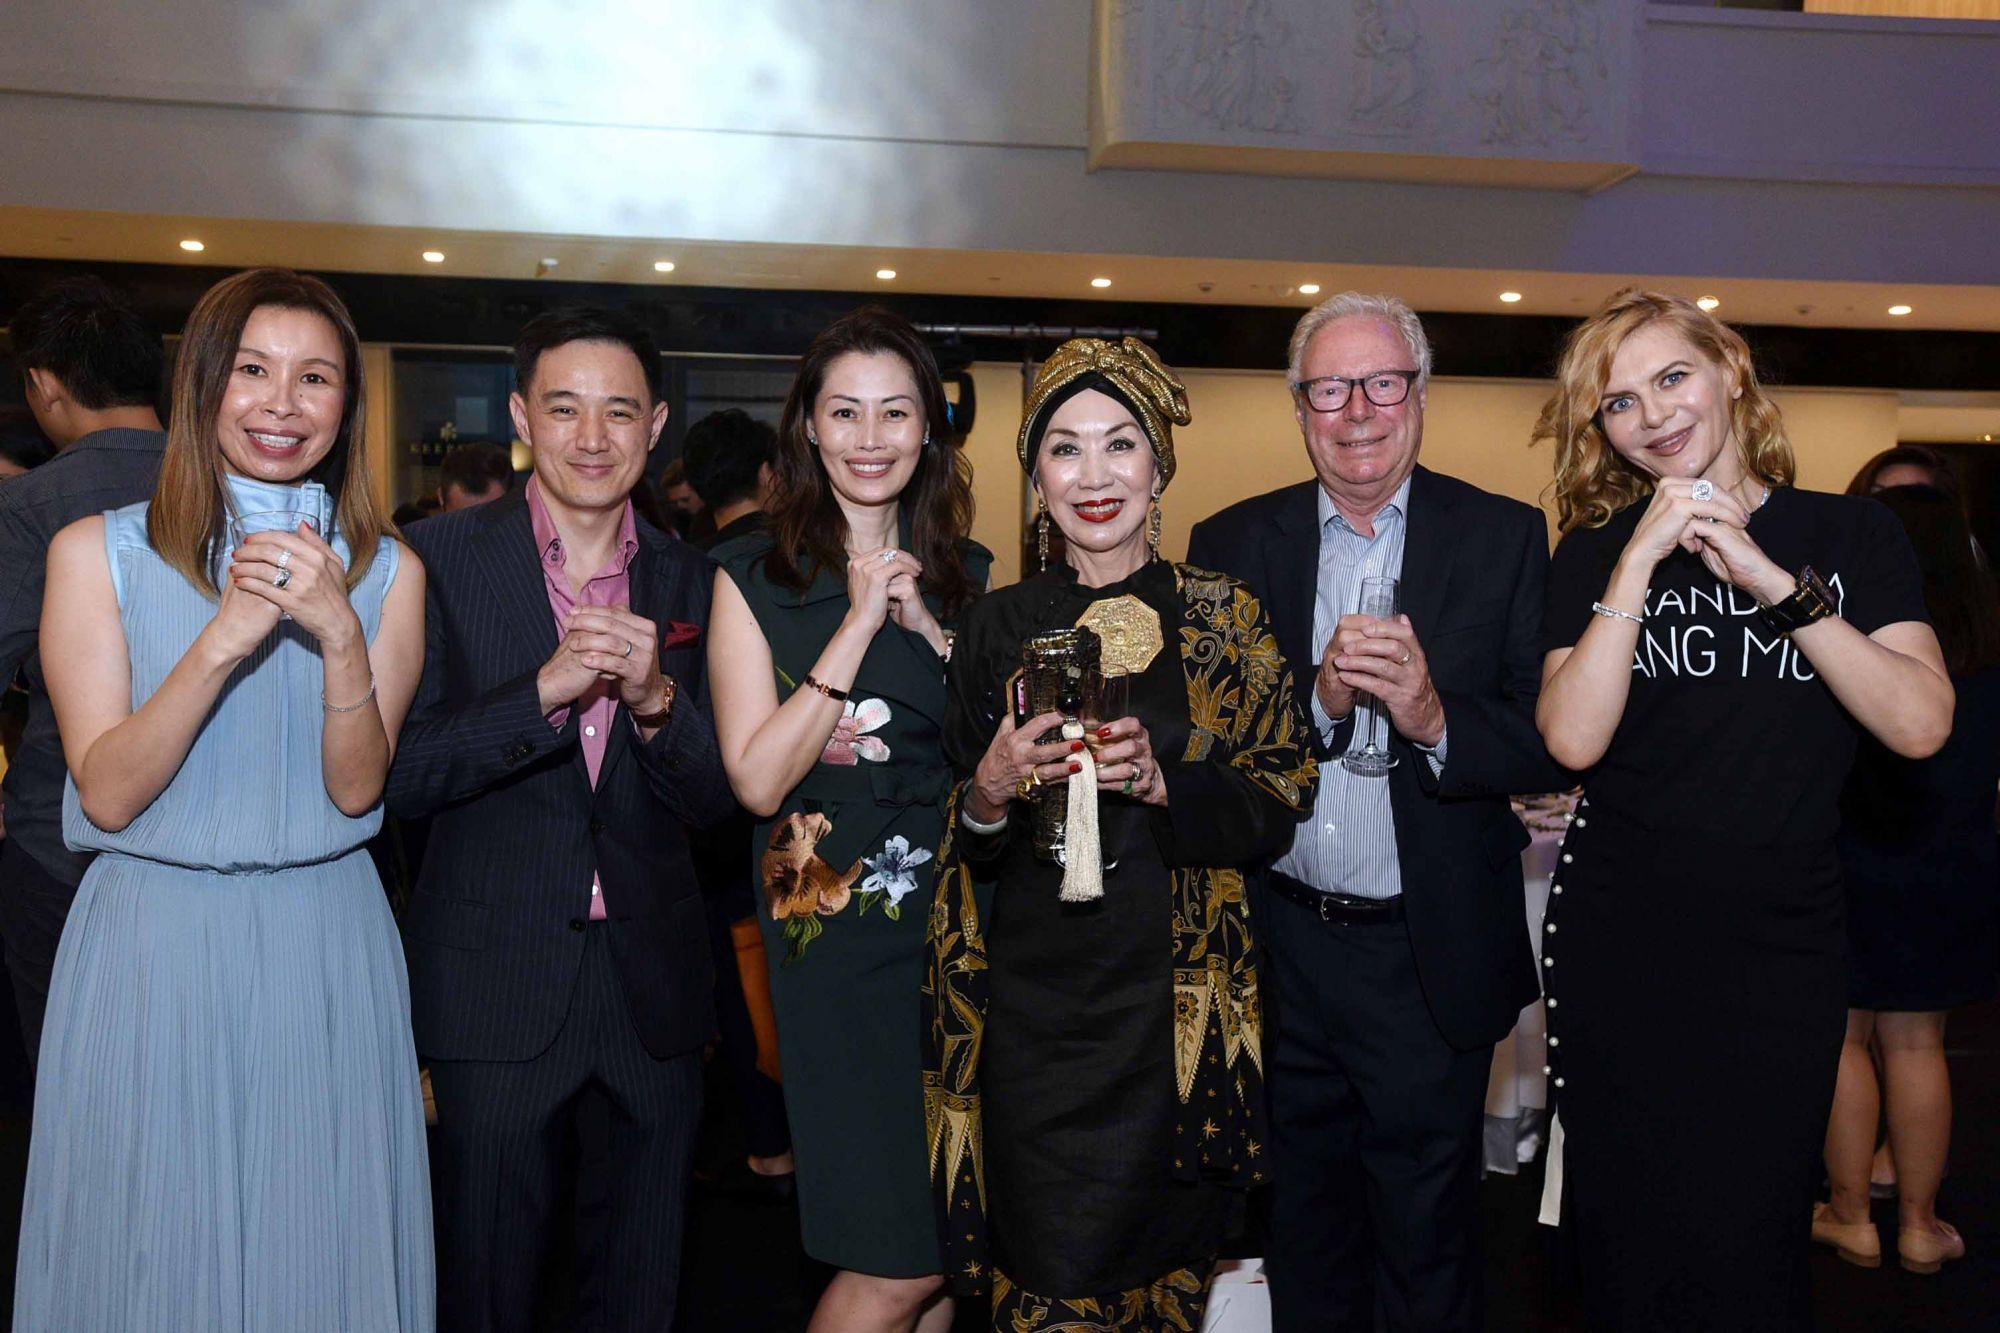 Stephanie Tay, Benjamin Kim, Serene Tan, Peggy Jeffs, Tony Jeffs, Paulina Böhm